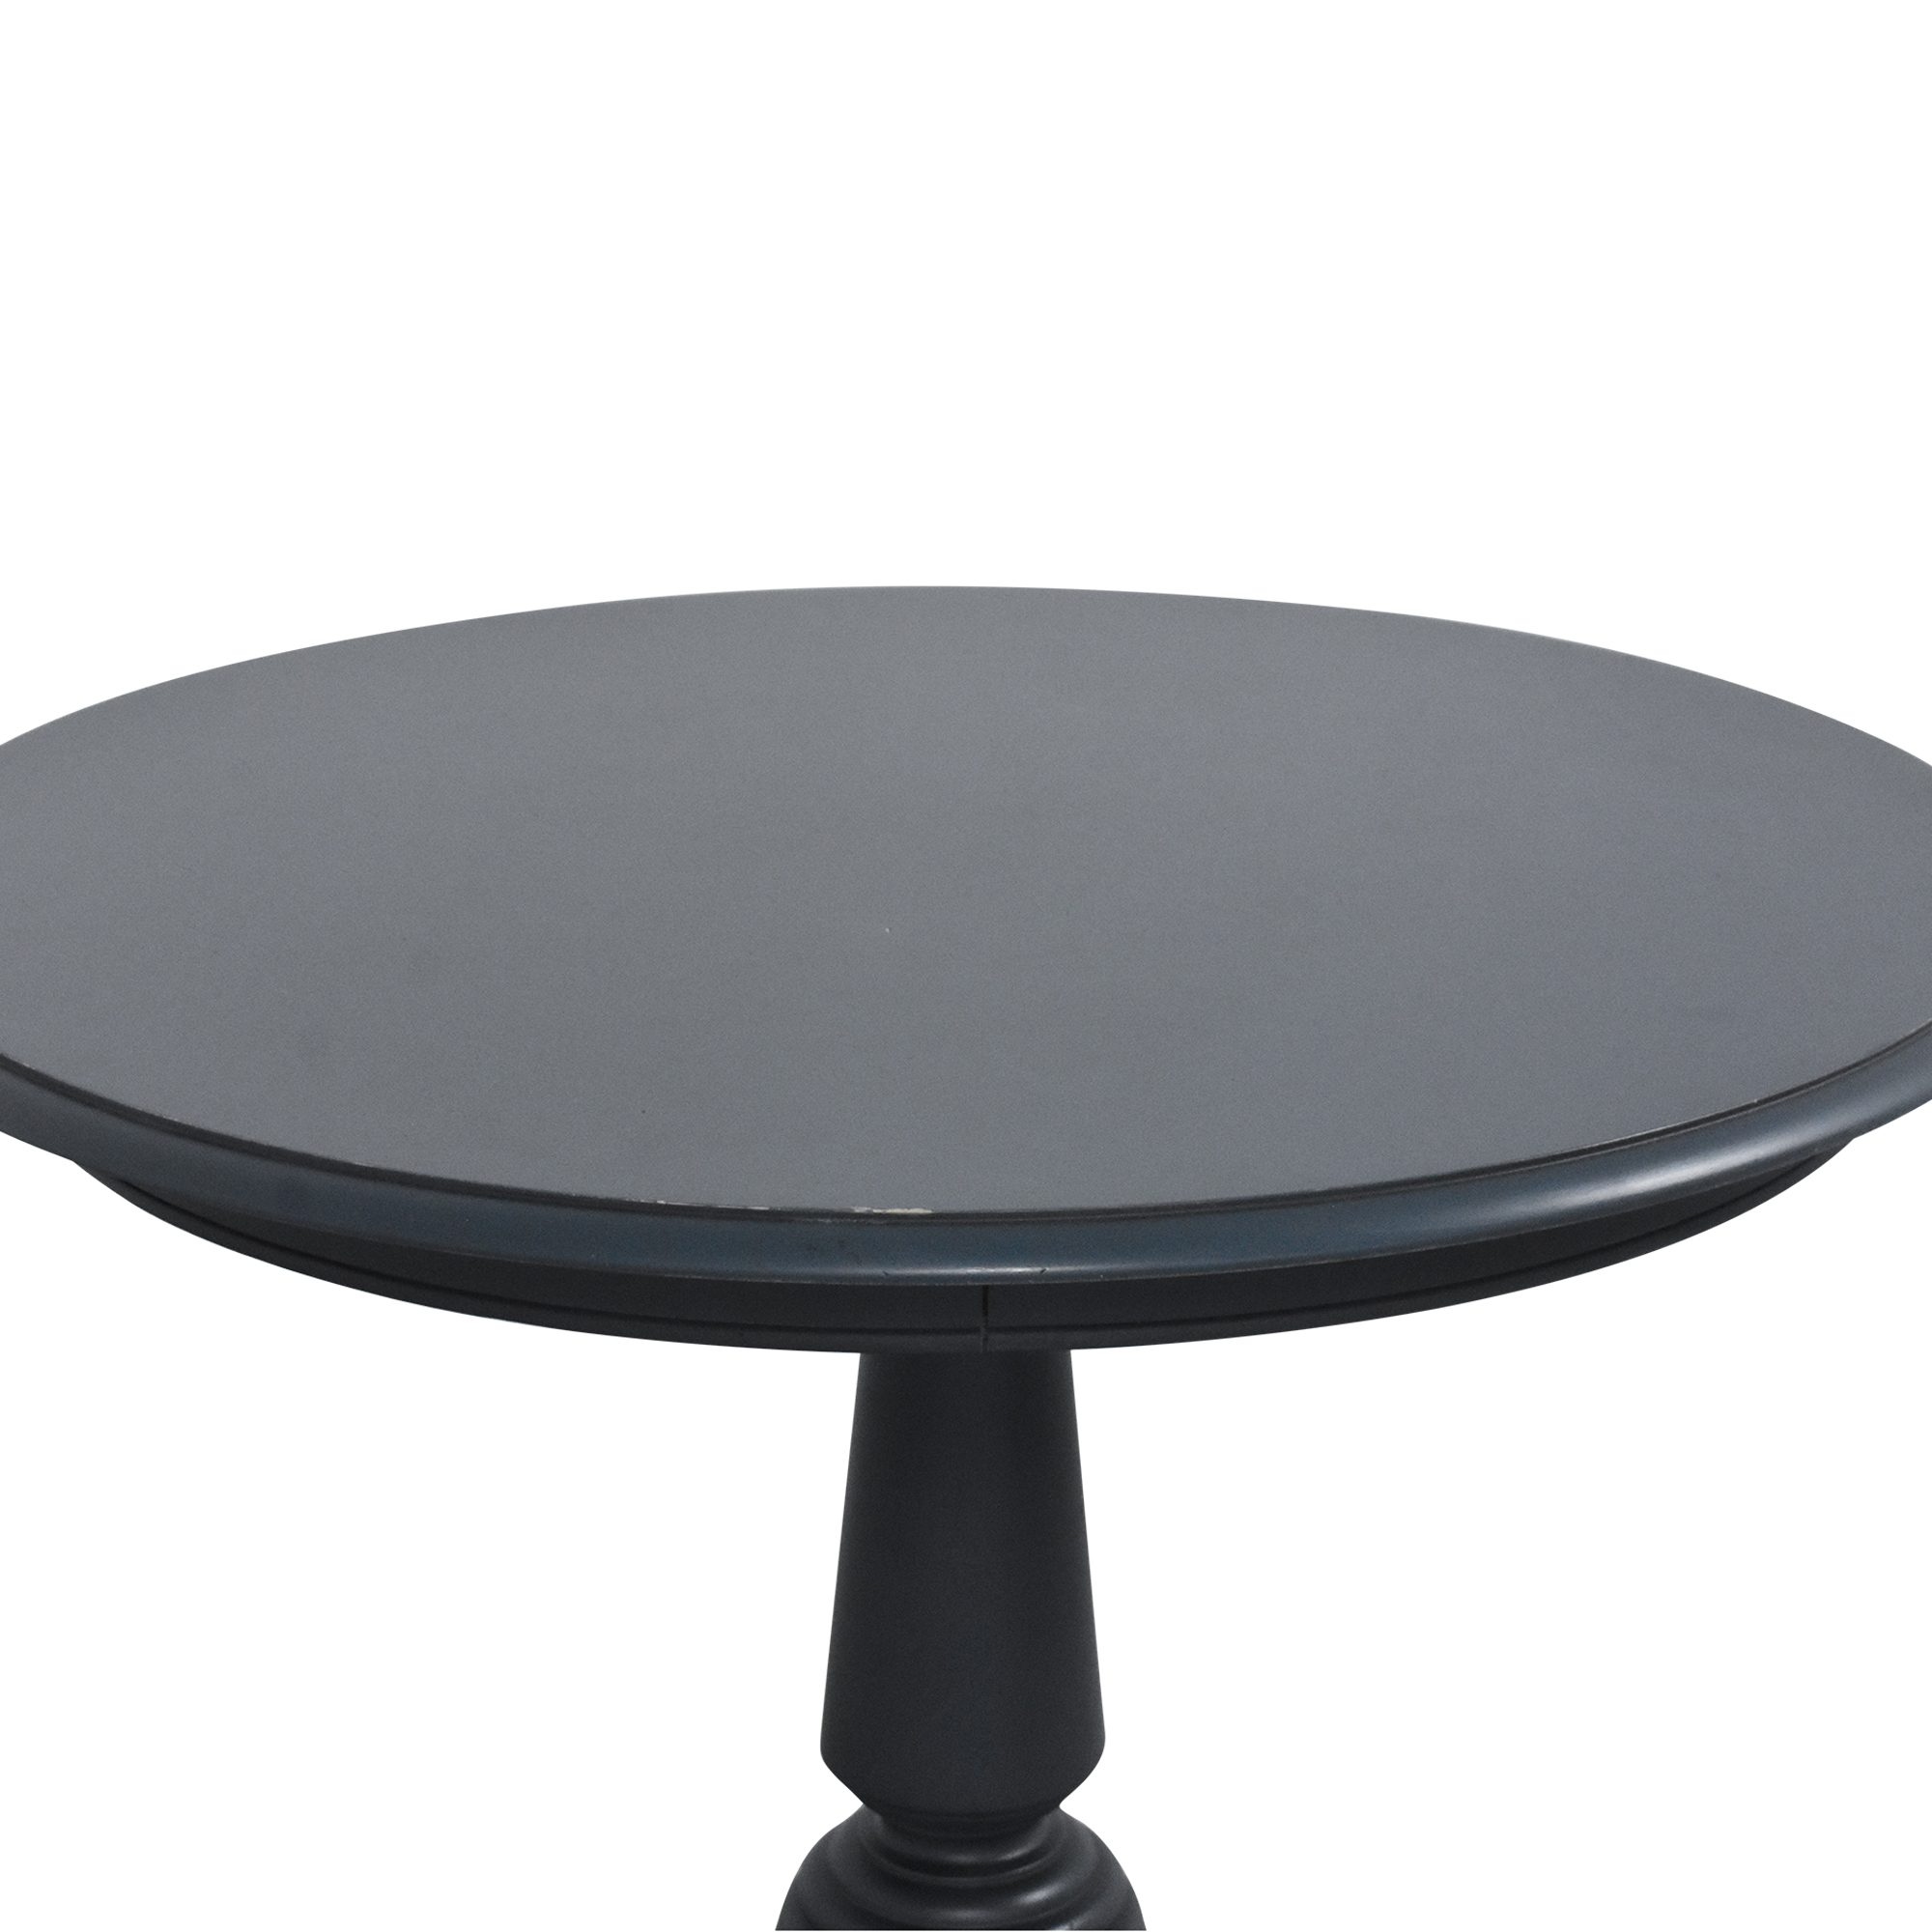 Ethan Allen Ethan Allen Tanner Pedestal Table nj